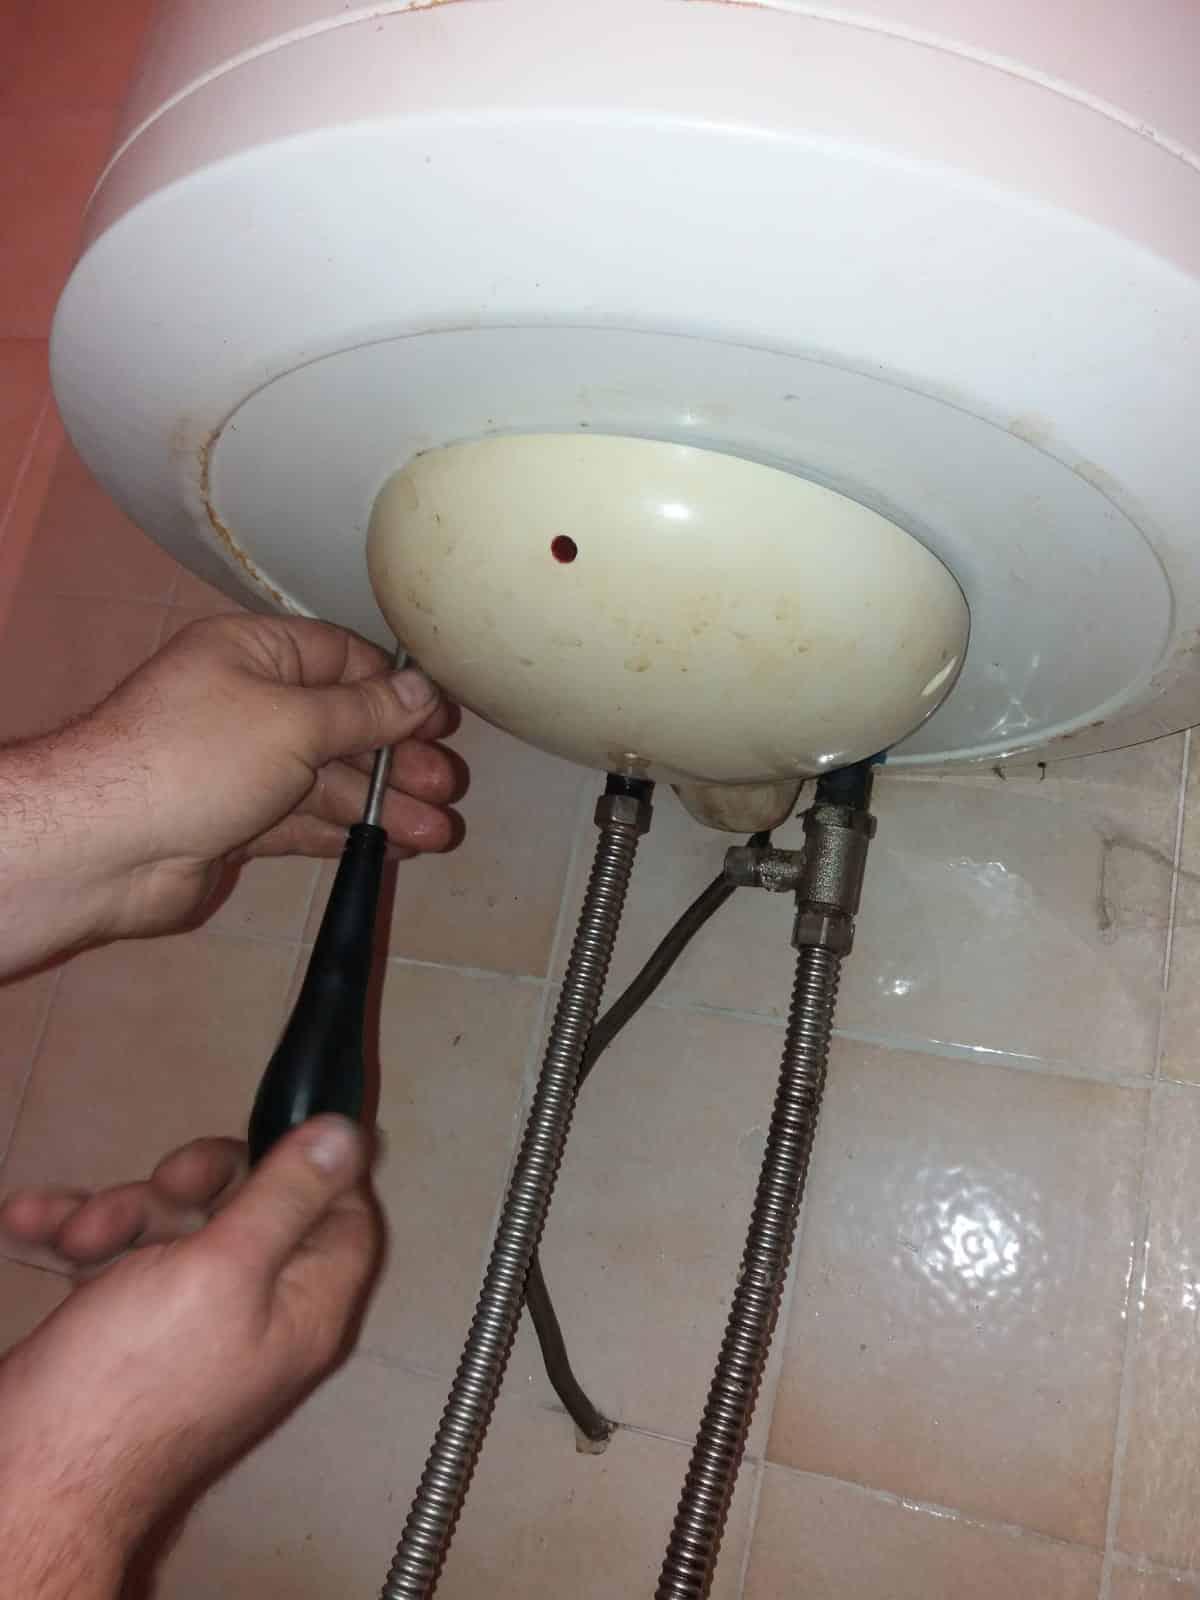 Zamena grejača i termostata na bojleru